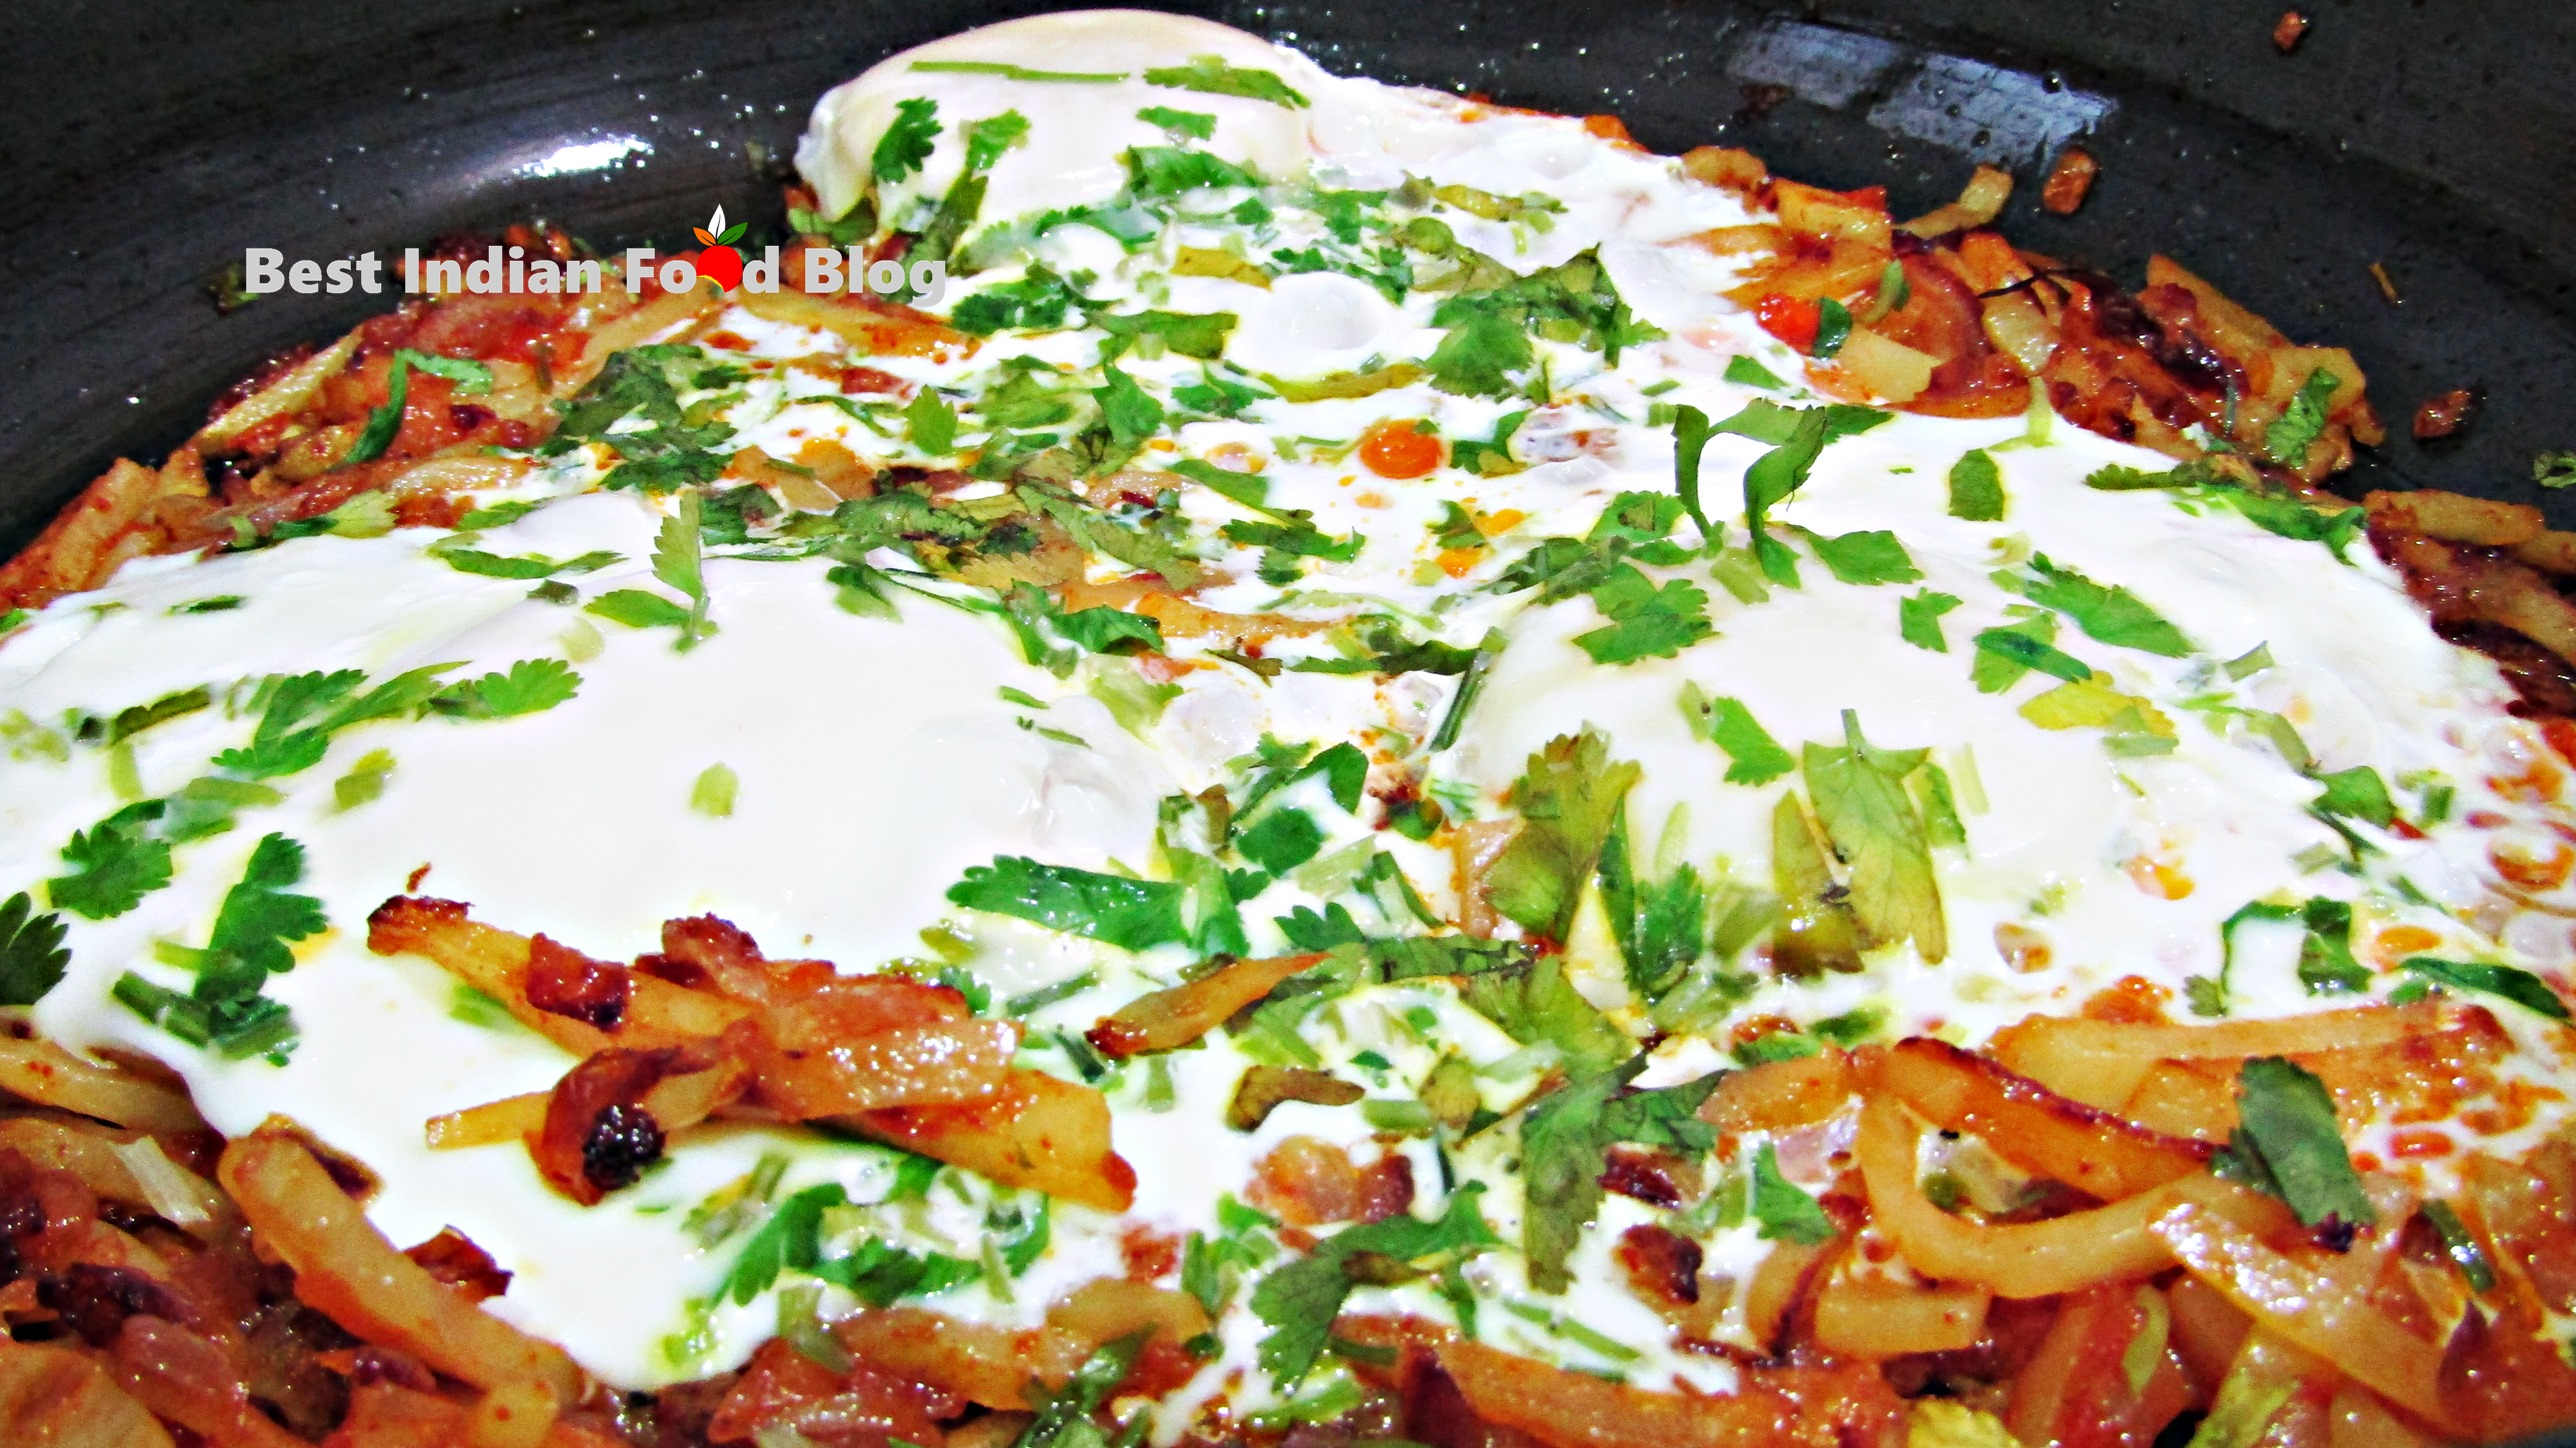 Papeta Par Eeda from Goa, India | Best Indian Food Blog | Potato Poultry egg recipe